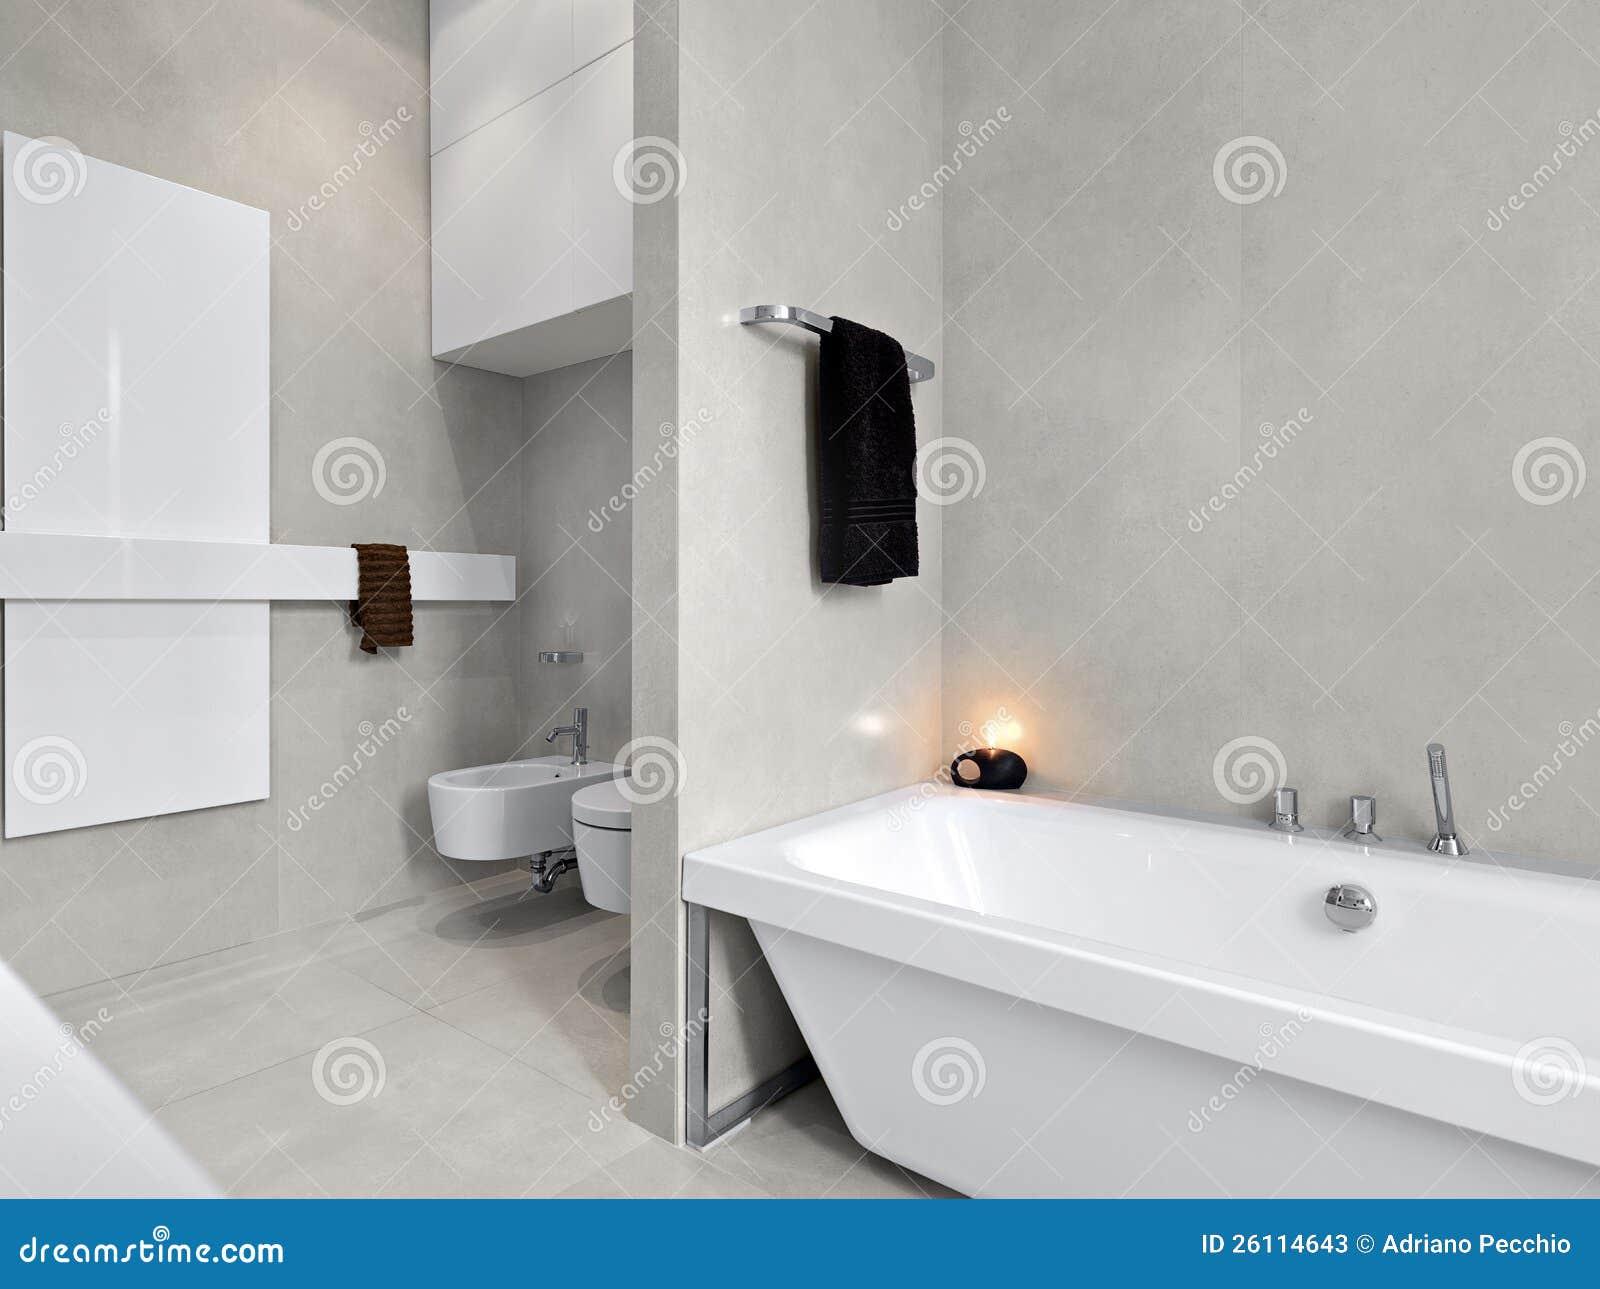 Vasca da bagno bianca moderna per la stanza da bagno immagine stock immagine di bathtub - Stucco per vasca da bagno ...